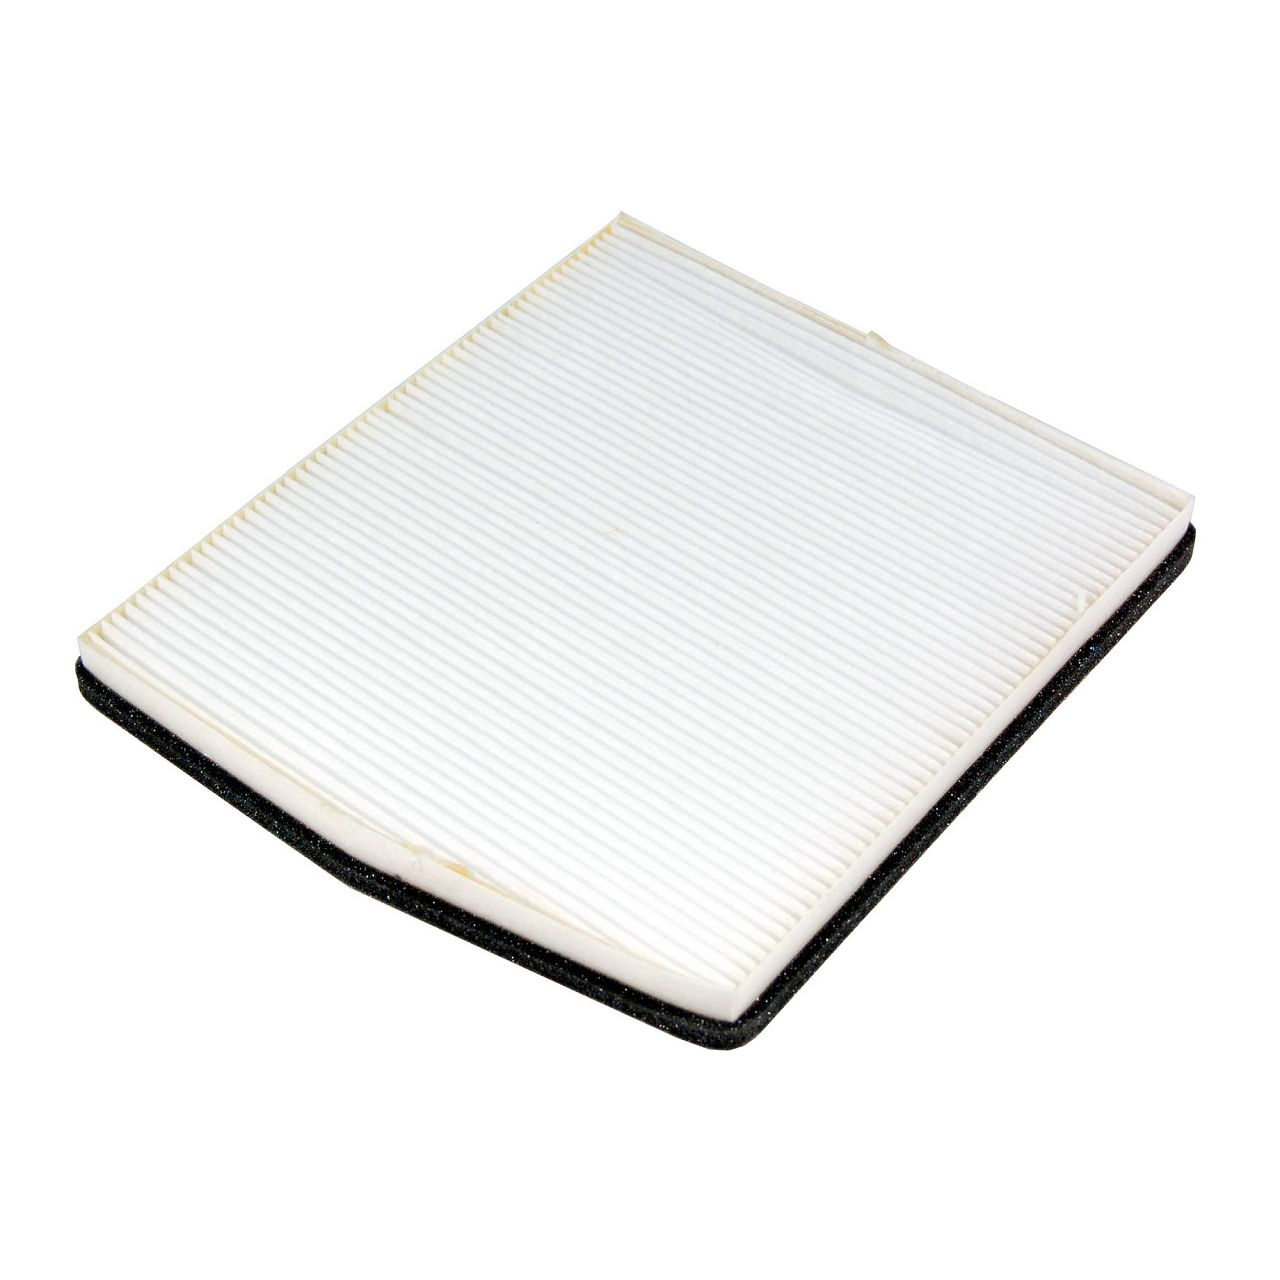 Innenraumfilter Pollenfilter VOLVO C70 I S60 I S70 S80 I V70 II XC90 I 30630752